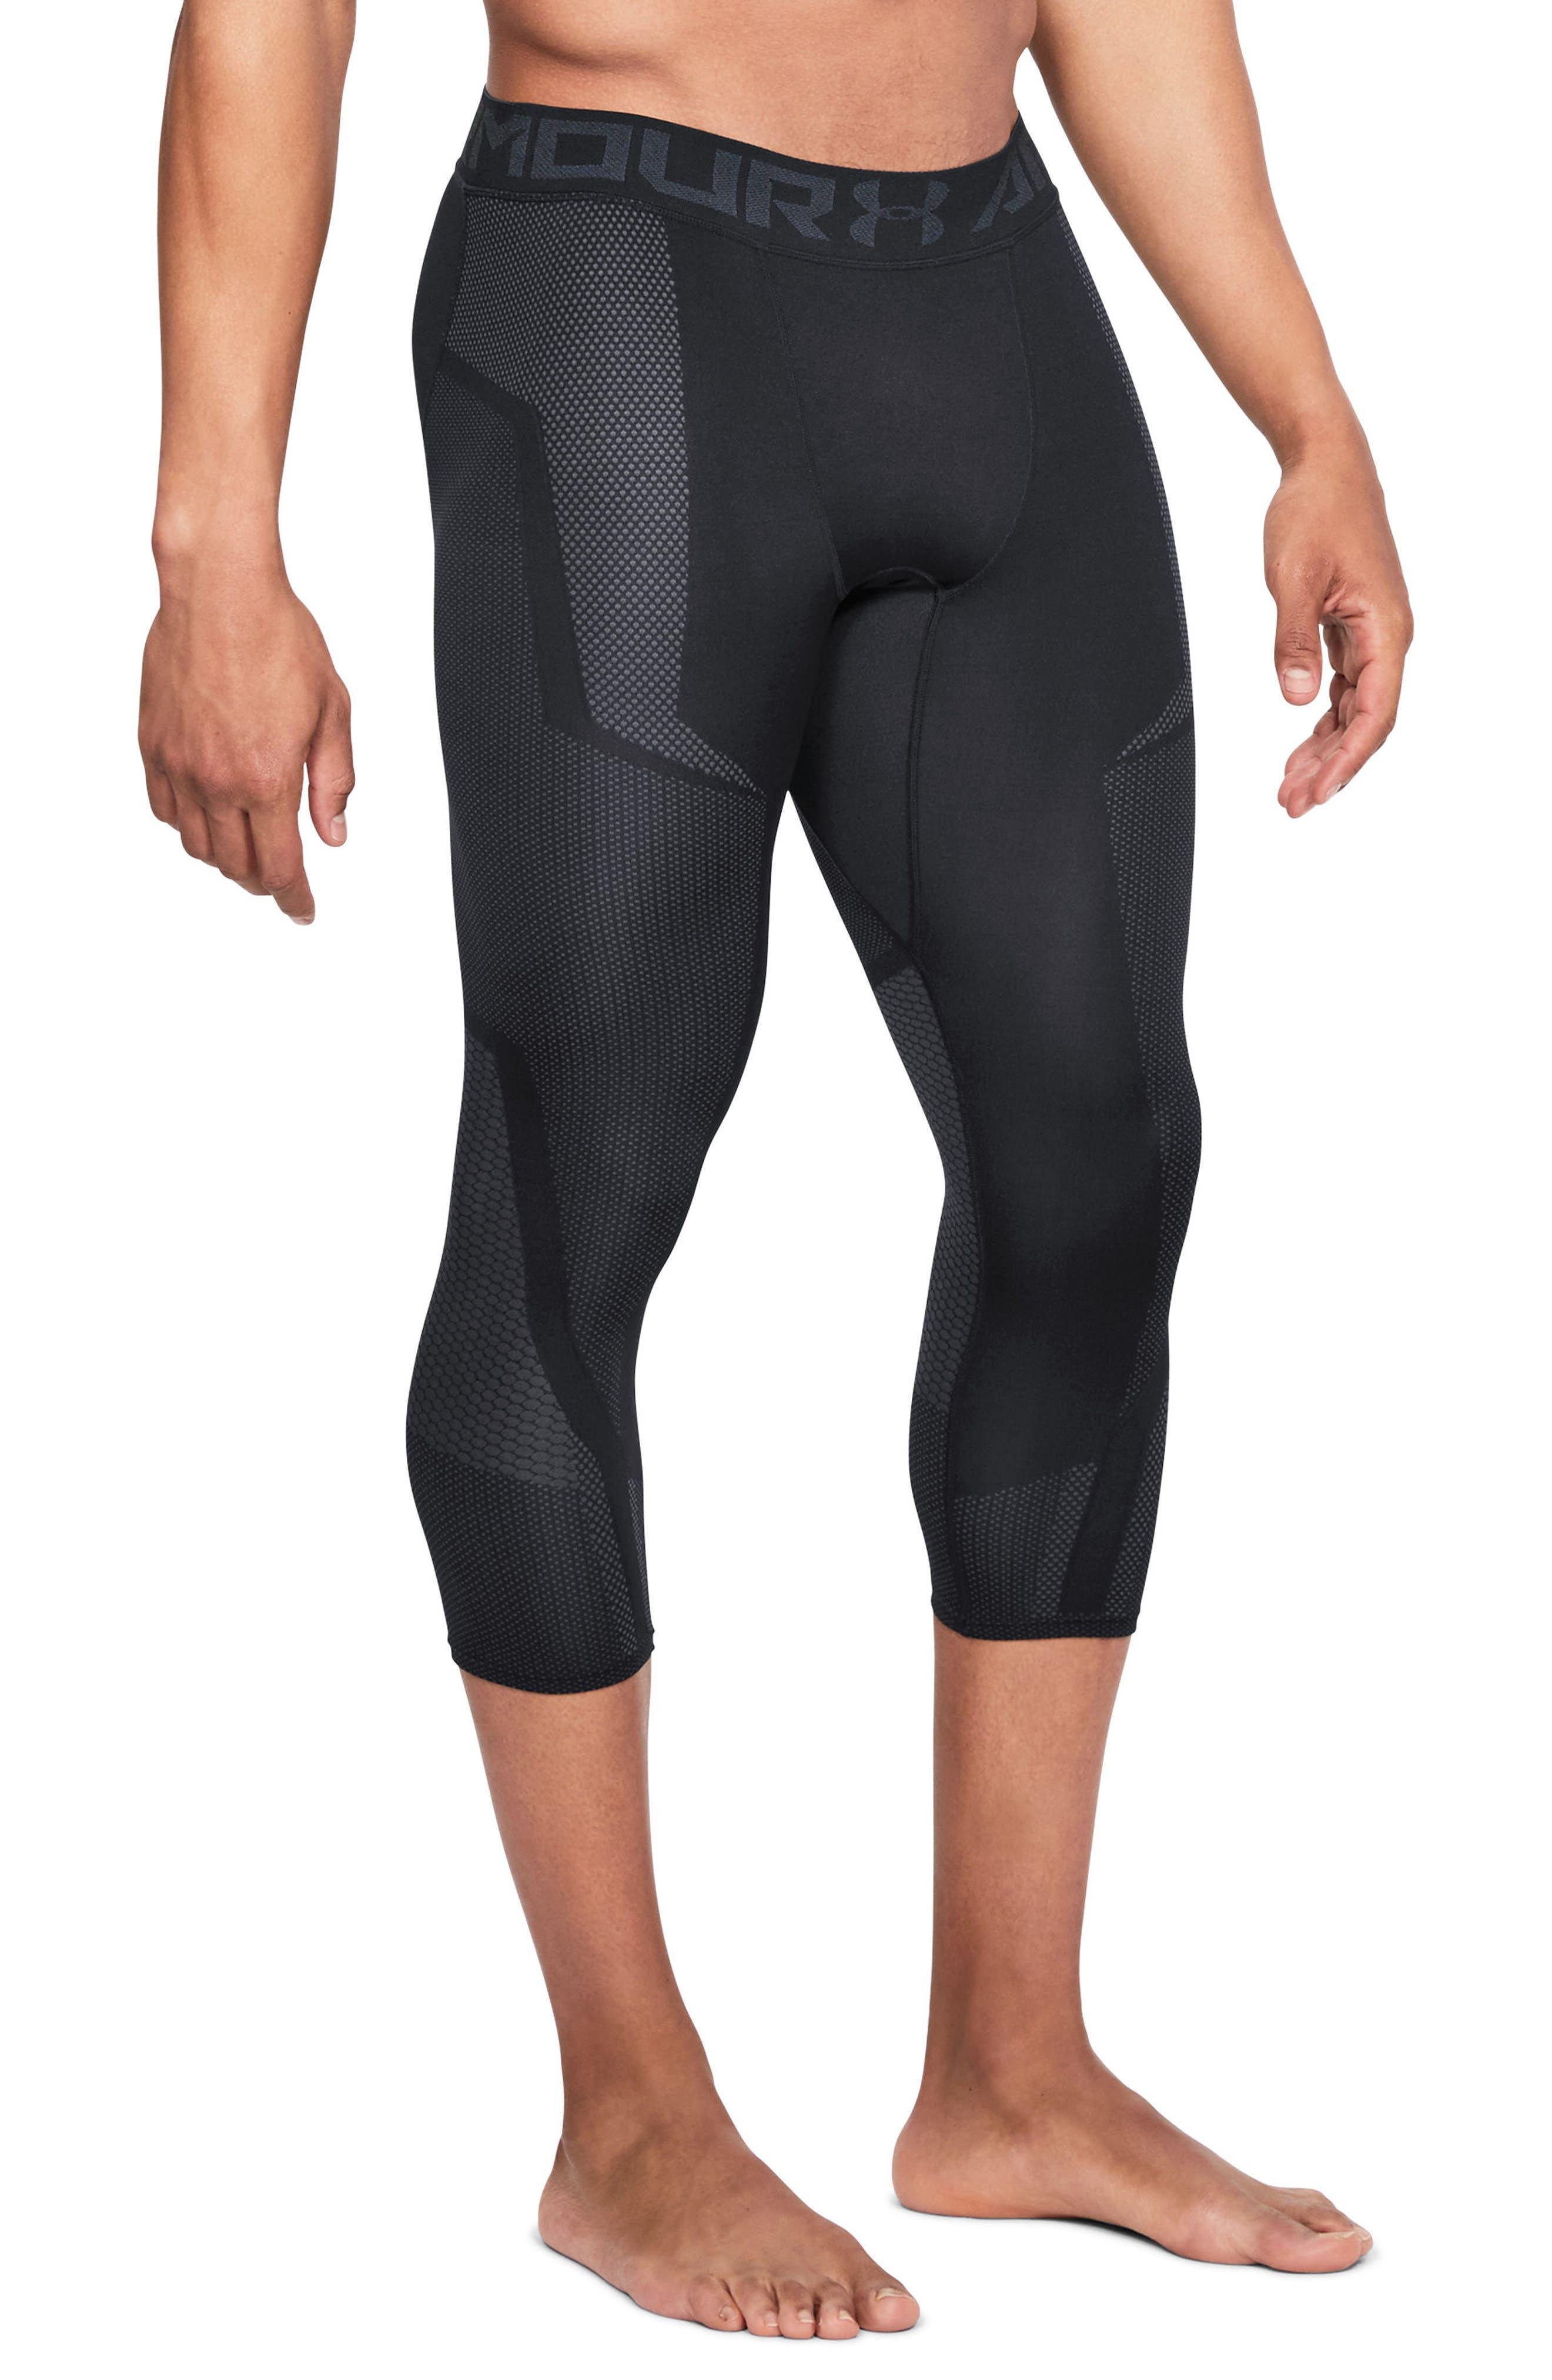 Threadborne Seamless Pants,                         Main,                         color, Black/ Stealth Gray